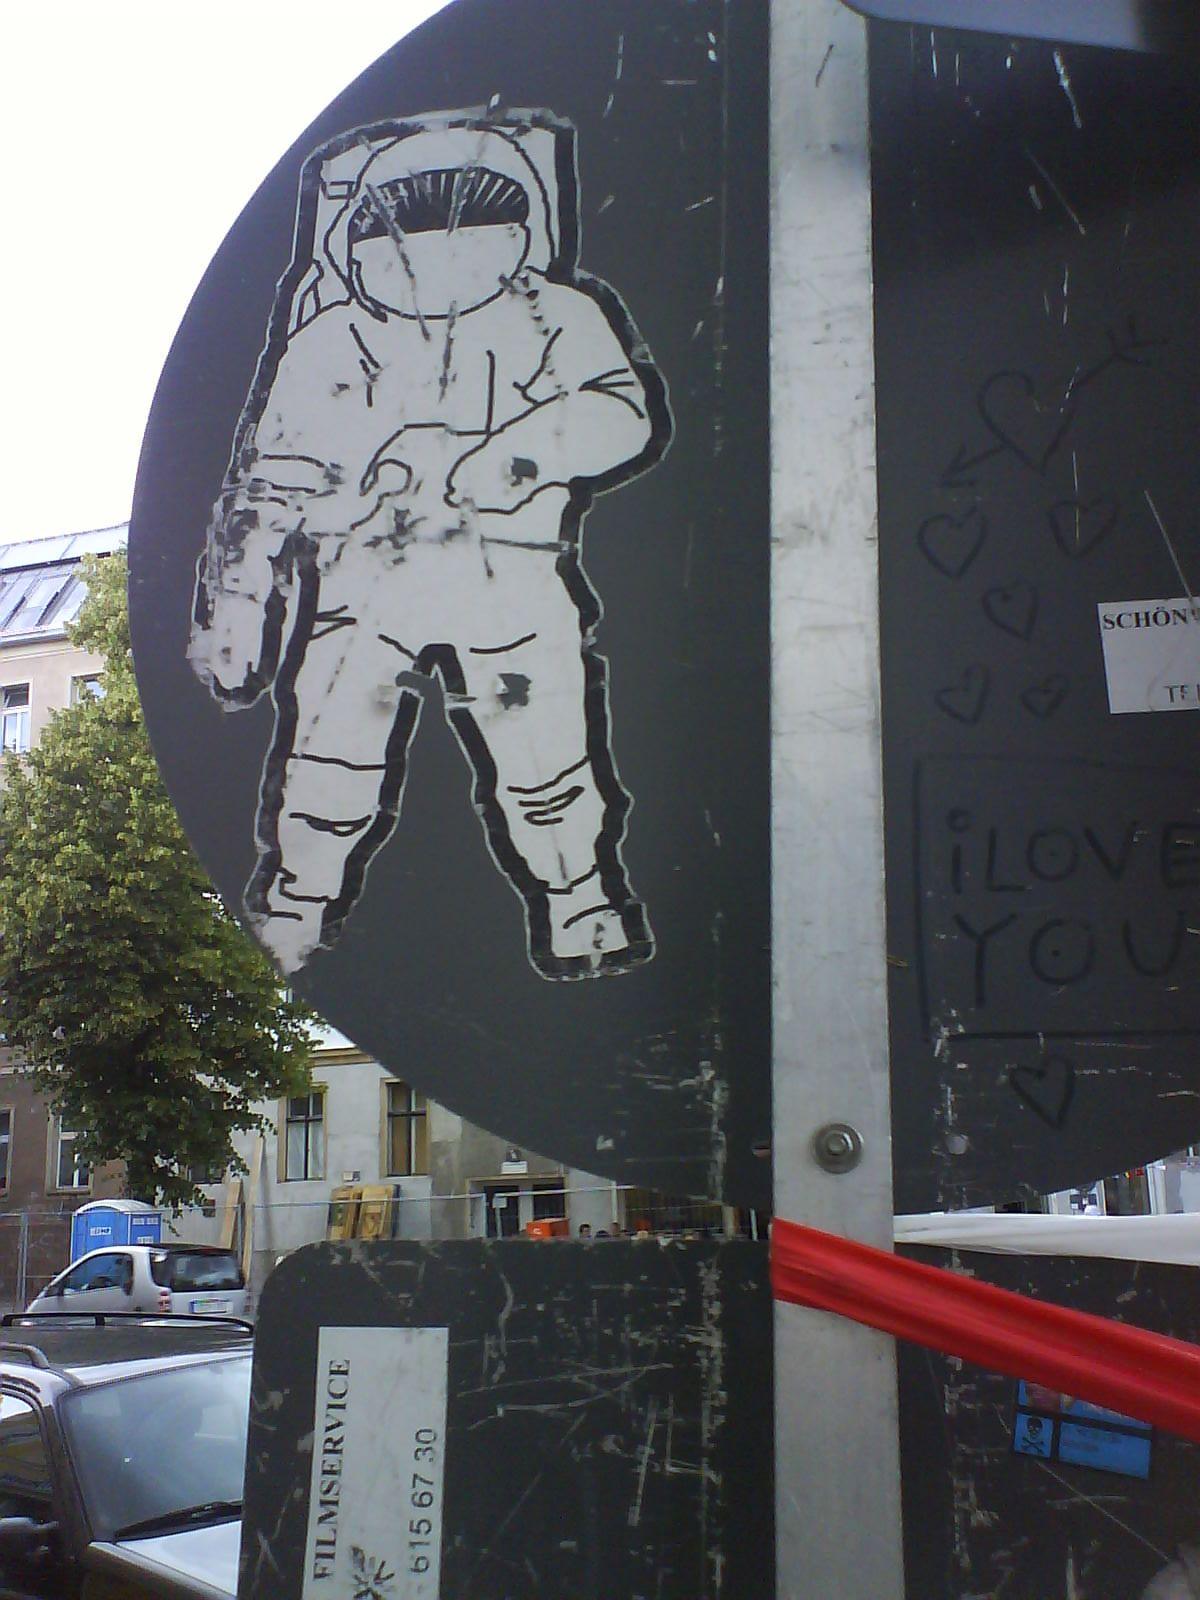 streetart-berlin-heute-mal-wieder-was-gesehen-02